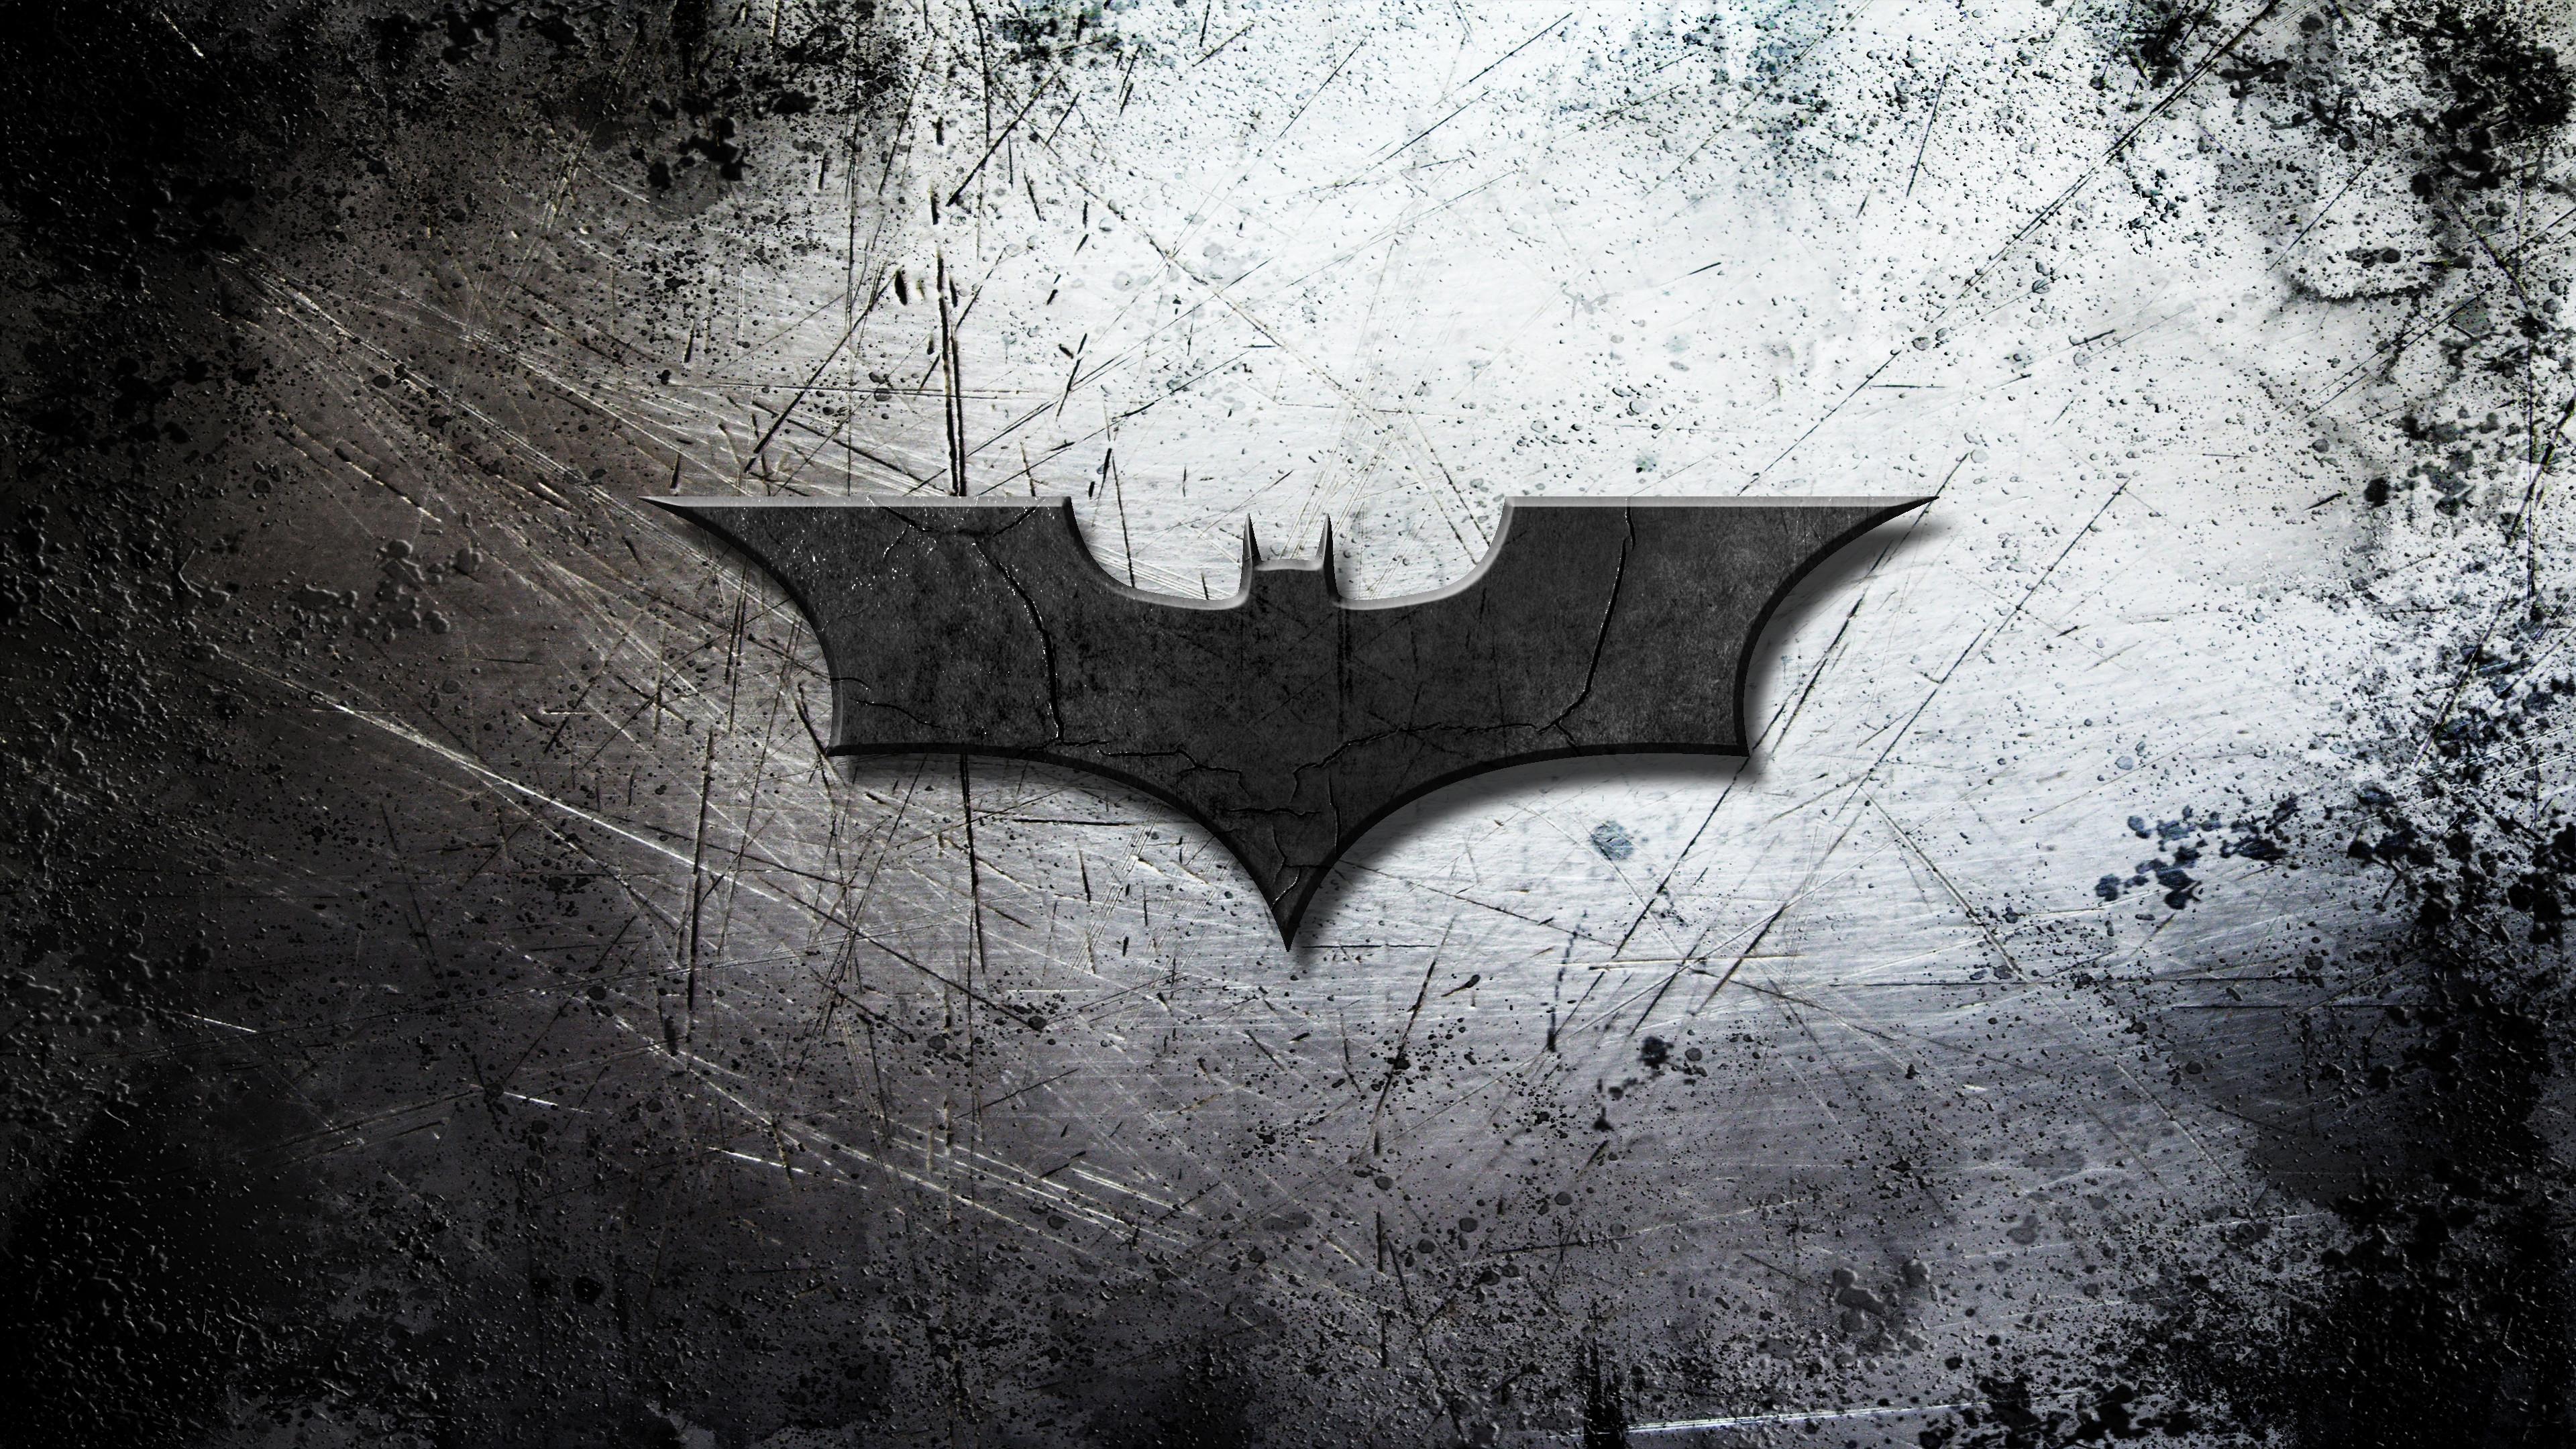 Batman Ultra Hd Wallpapers Top Free Batman Ultra Hd Backgrounds Wallpaperaccess